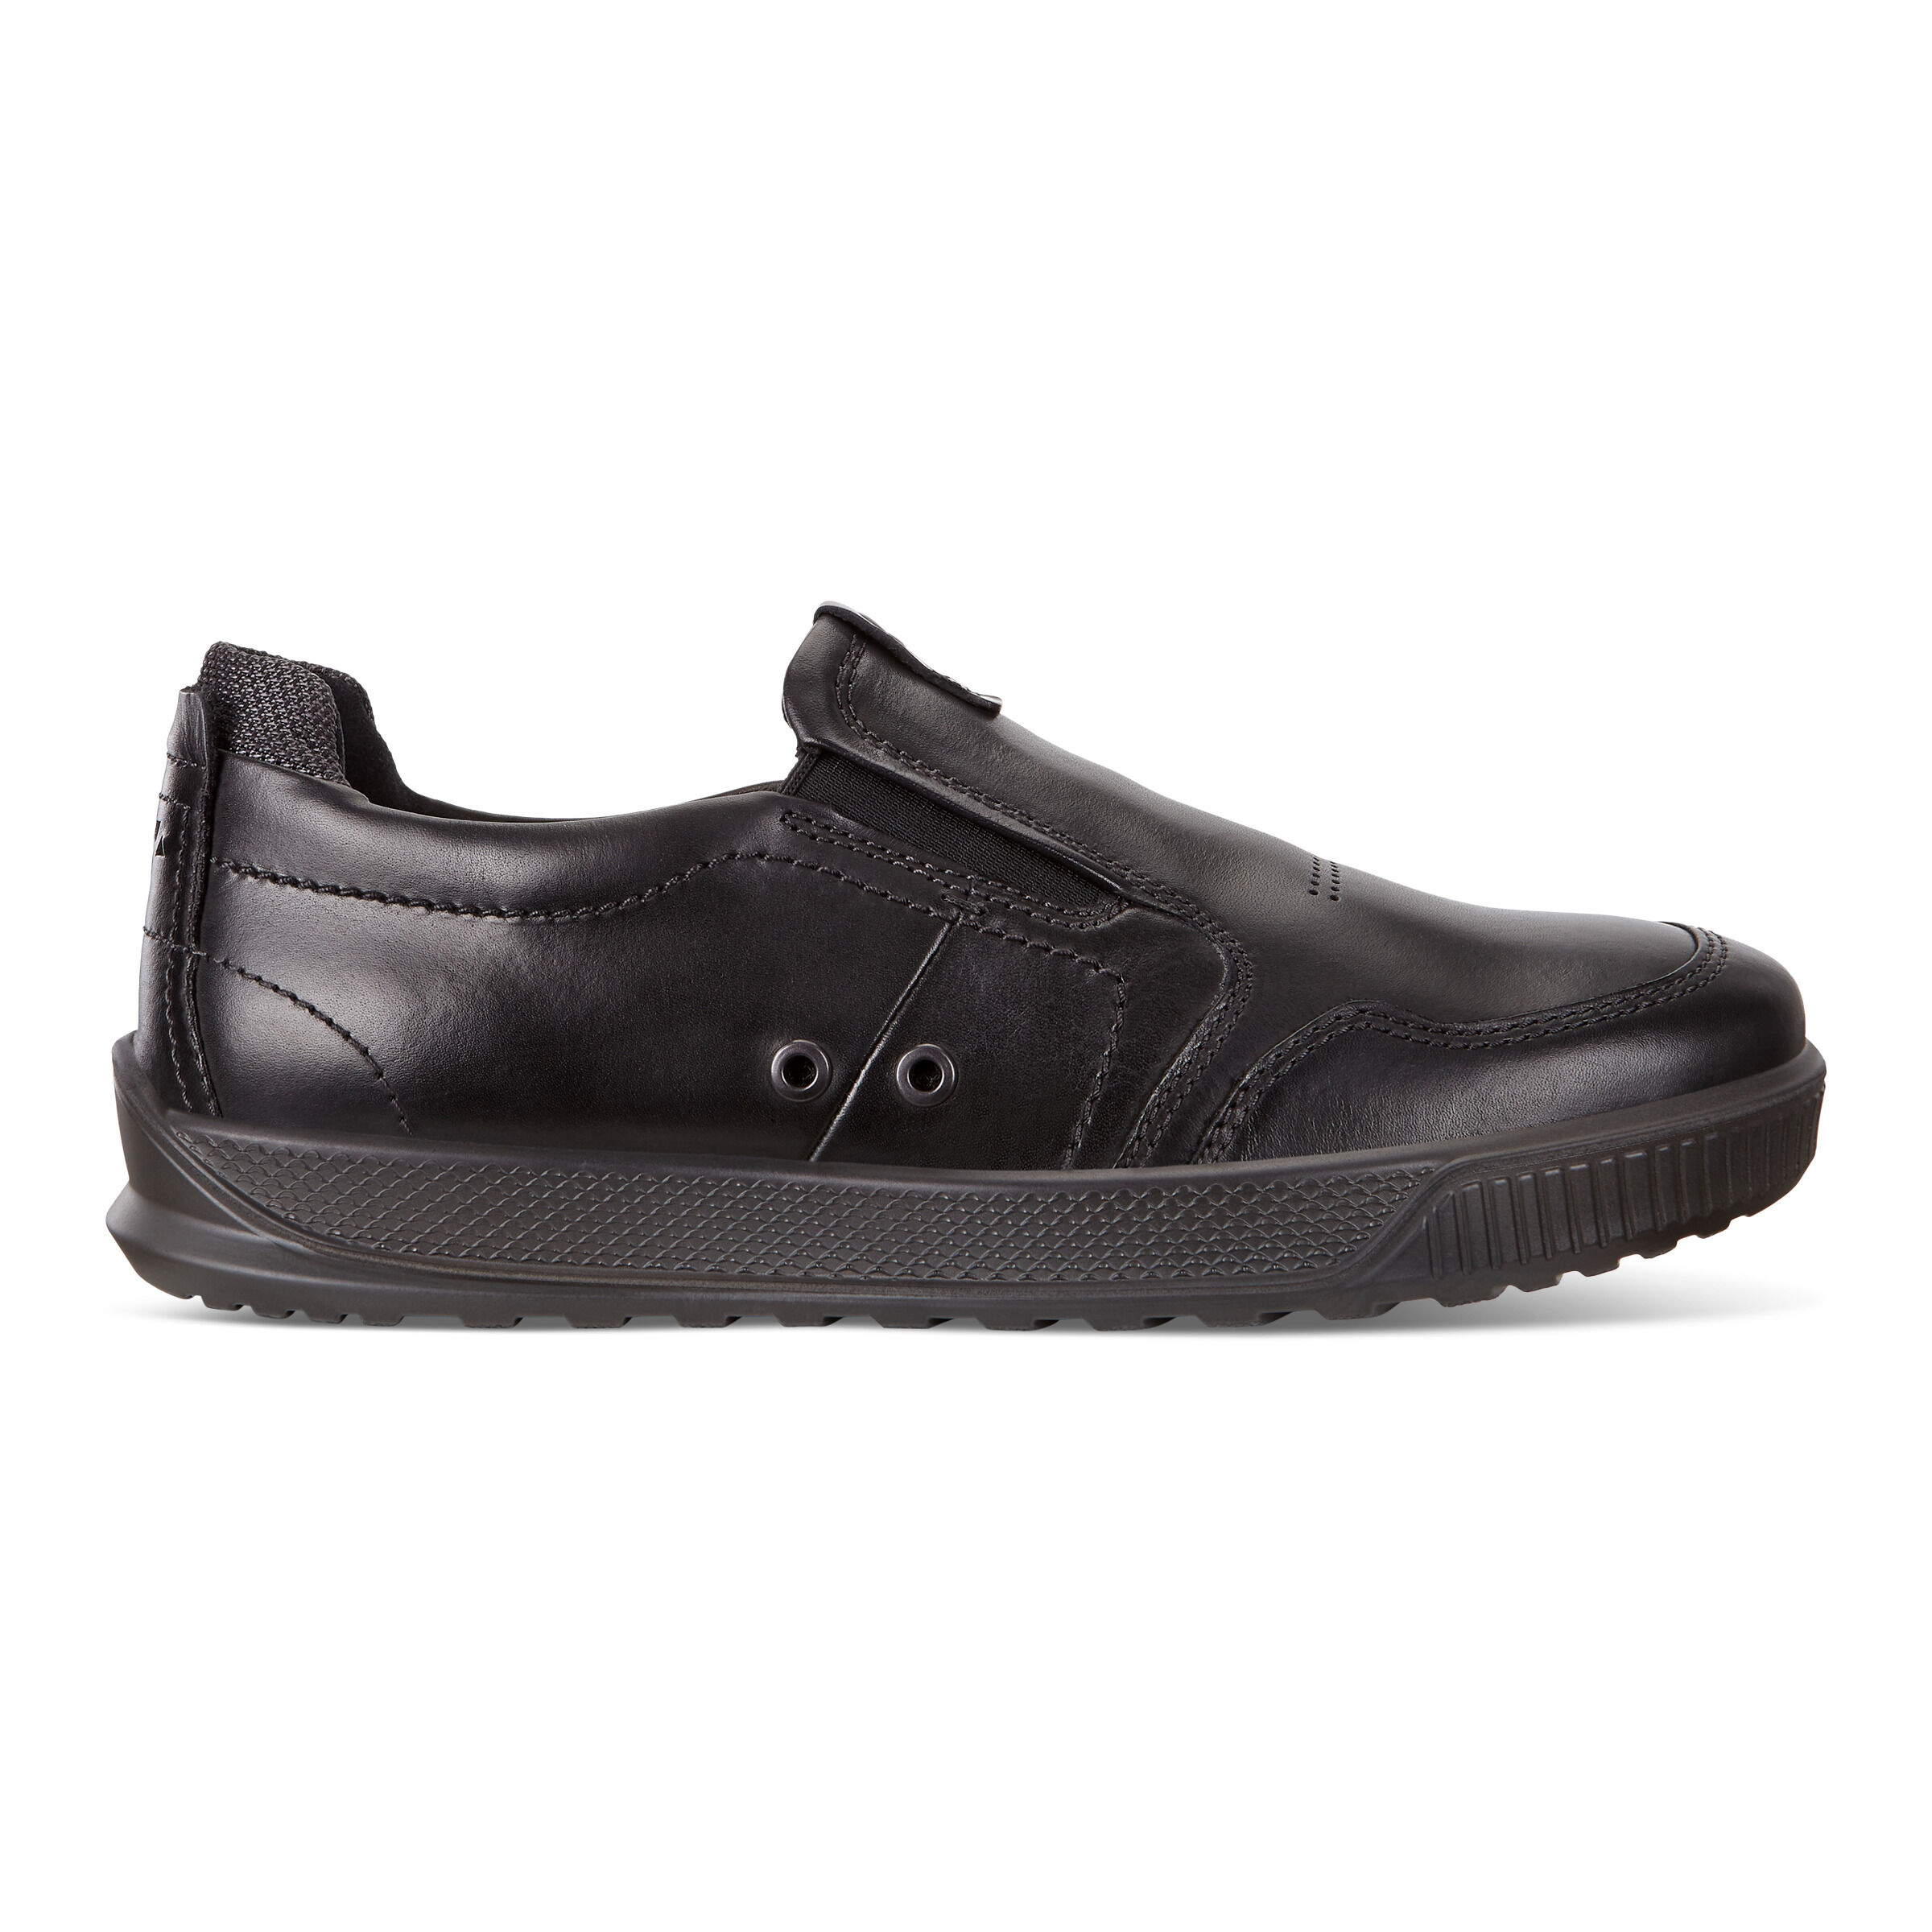 ECCO Byway Mens Slip On Sneaker